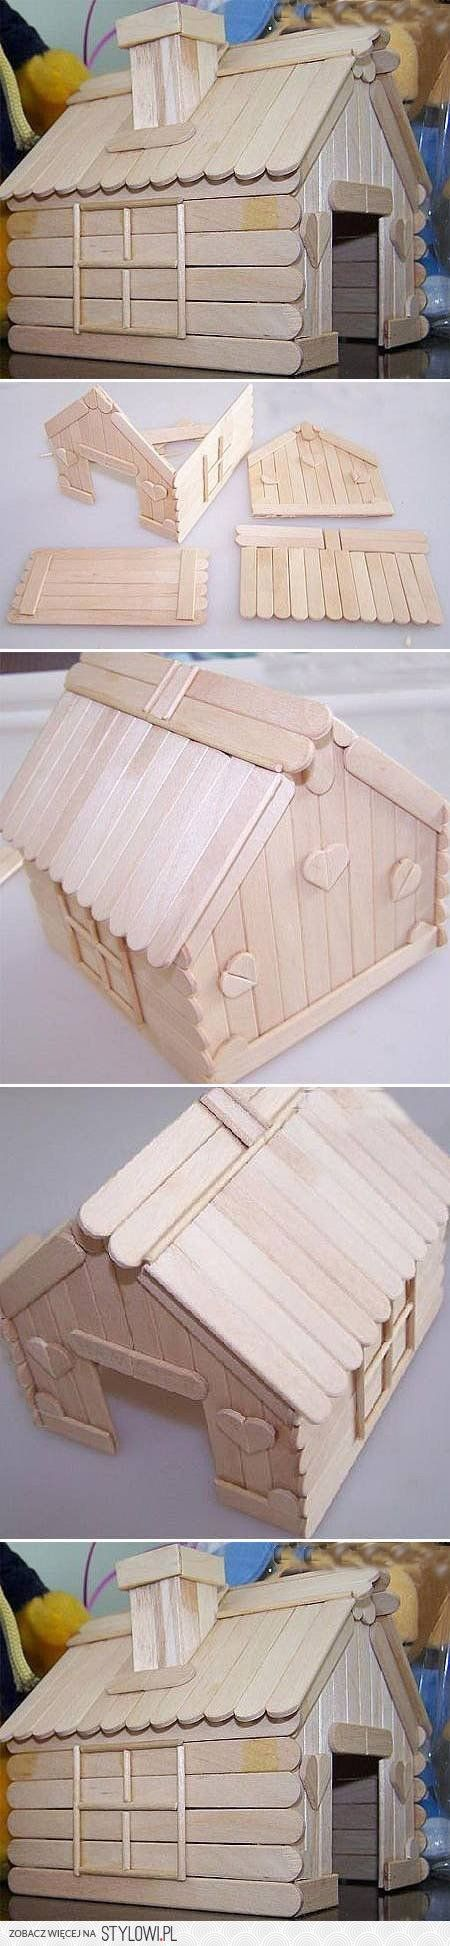 DIY Popsicle Stick House DIY Projects   UsefulDIY.com na Stylowi.pl